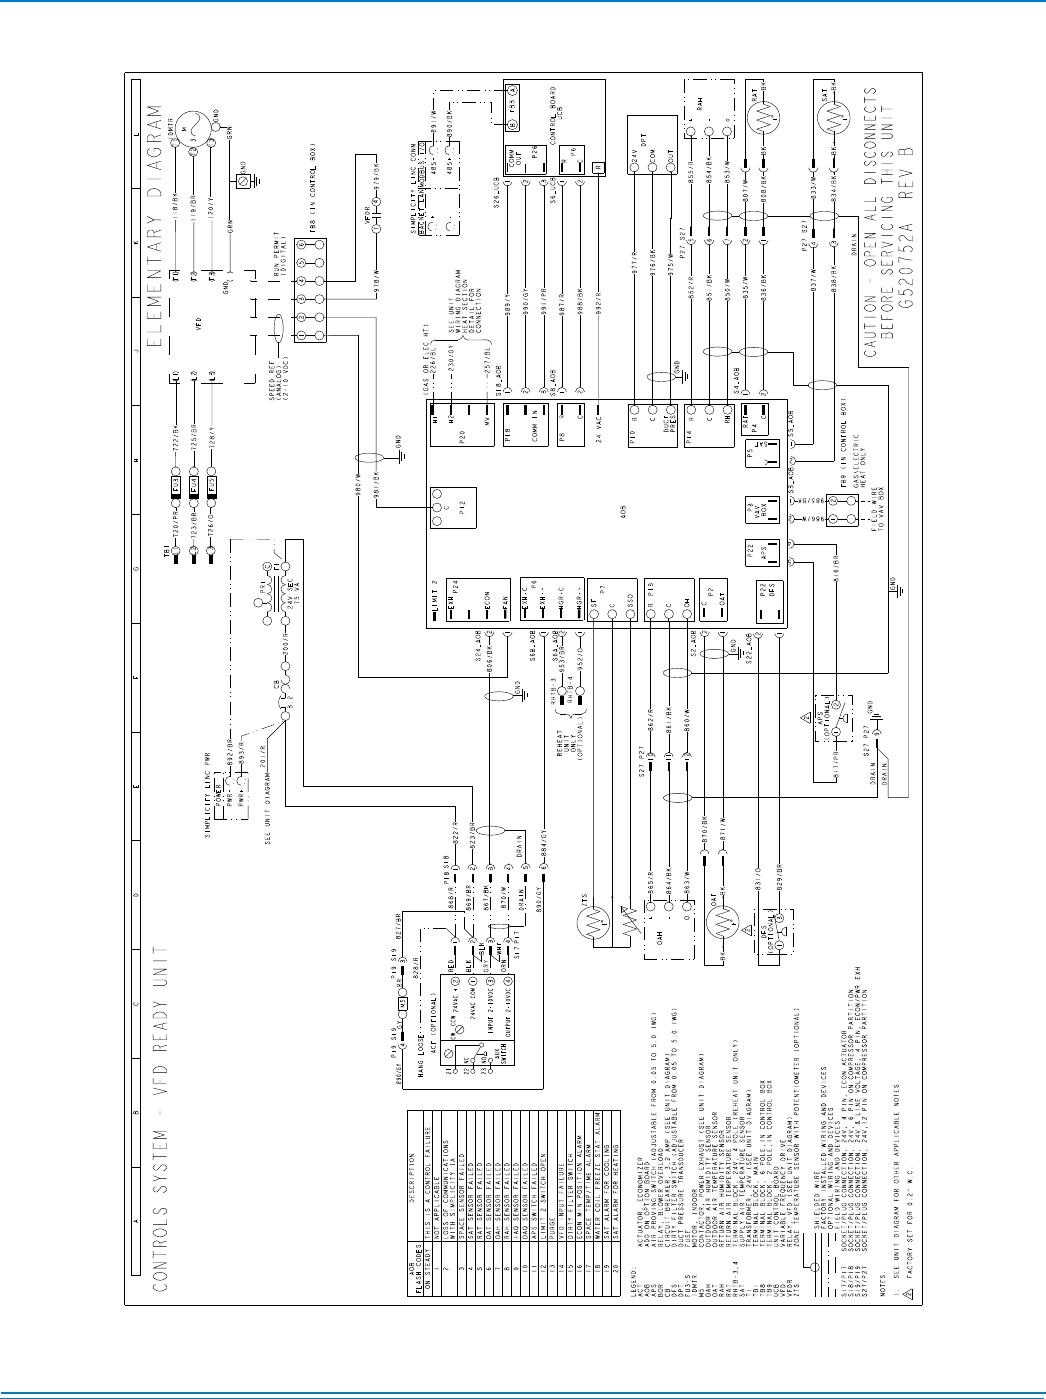 York Zf Predator R410a 11 2 Eer Technical Guide Rtu Schematic 528194 Ytg K 0812